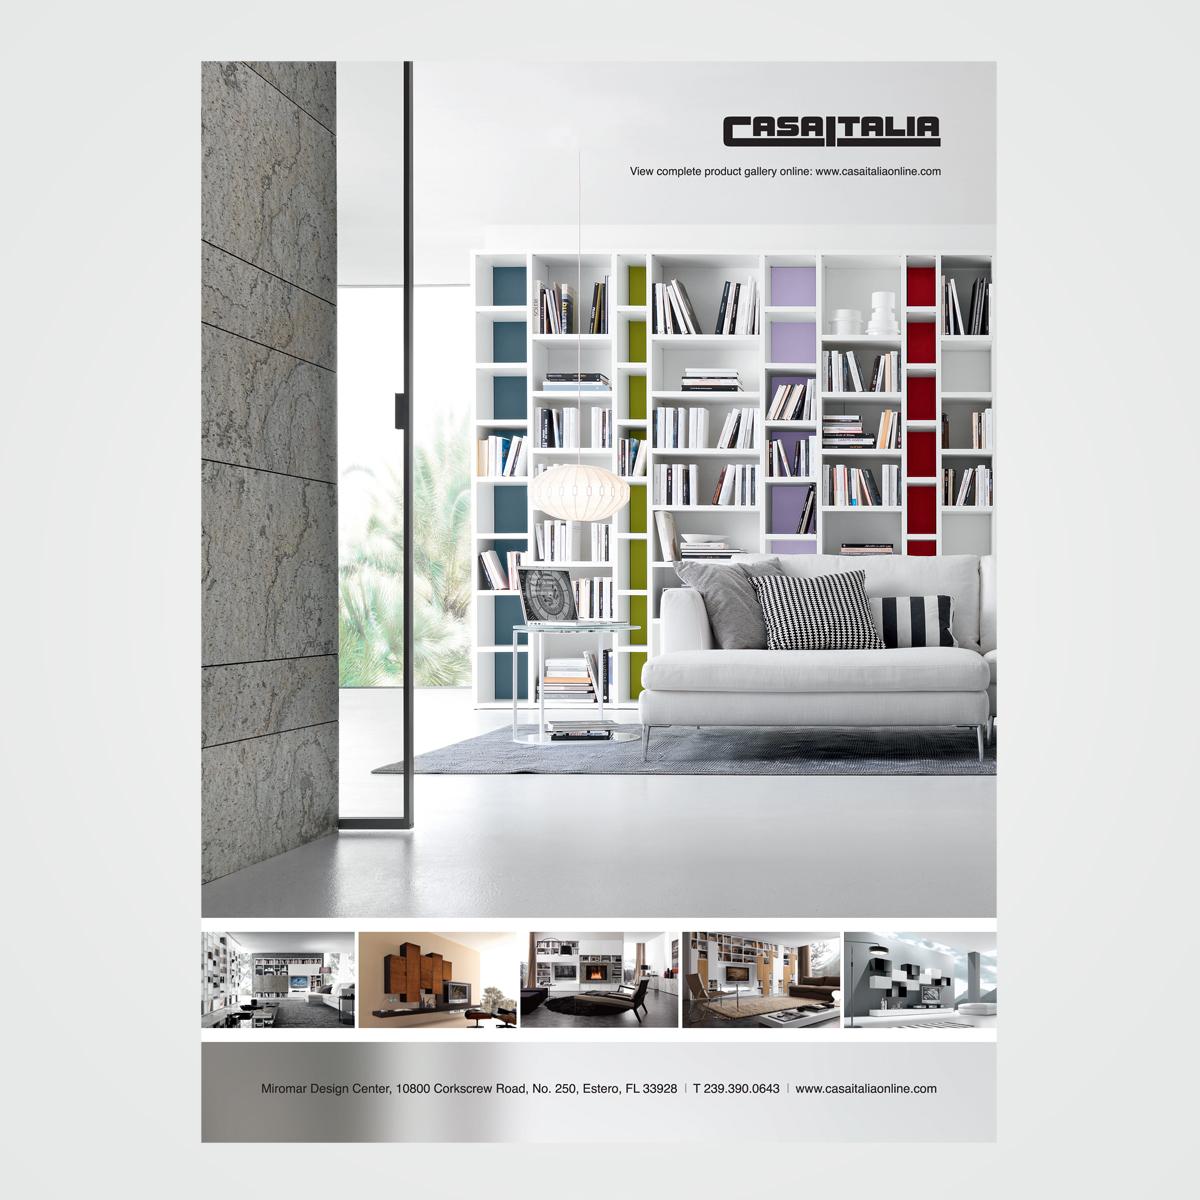 Magazine ad design for Casa Italia, an exclusive showroom representing leading contemporary Italian furniture manufacturers